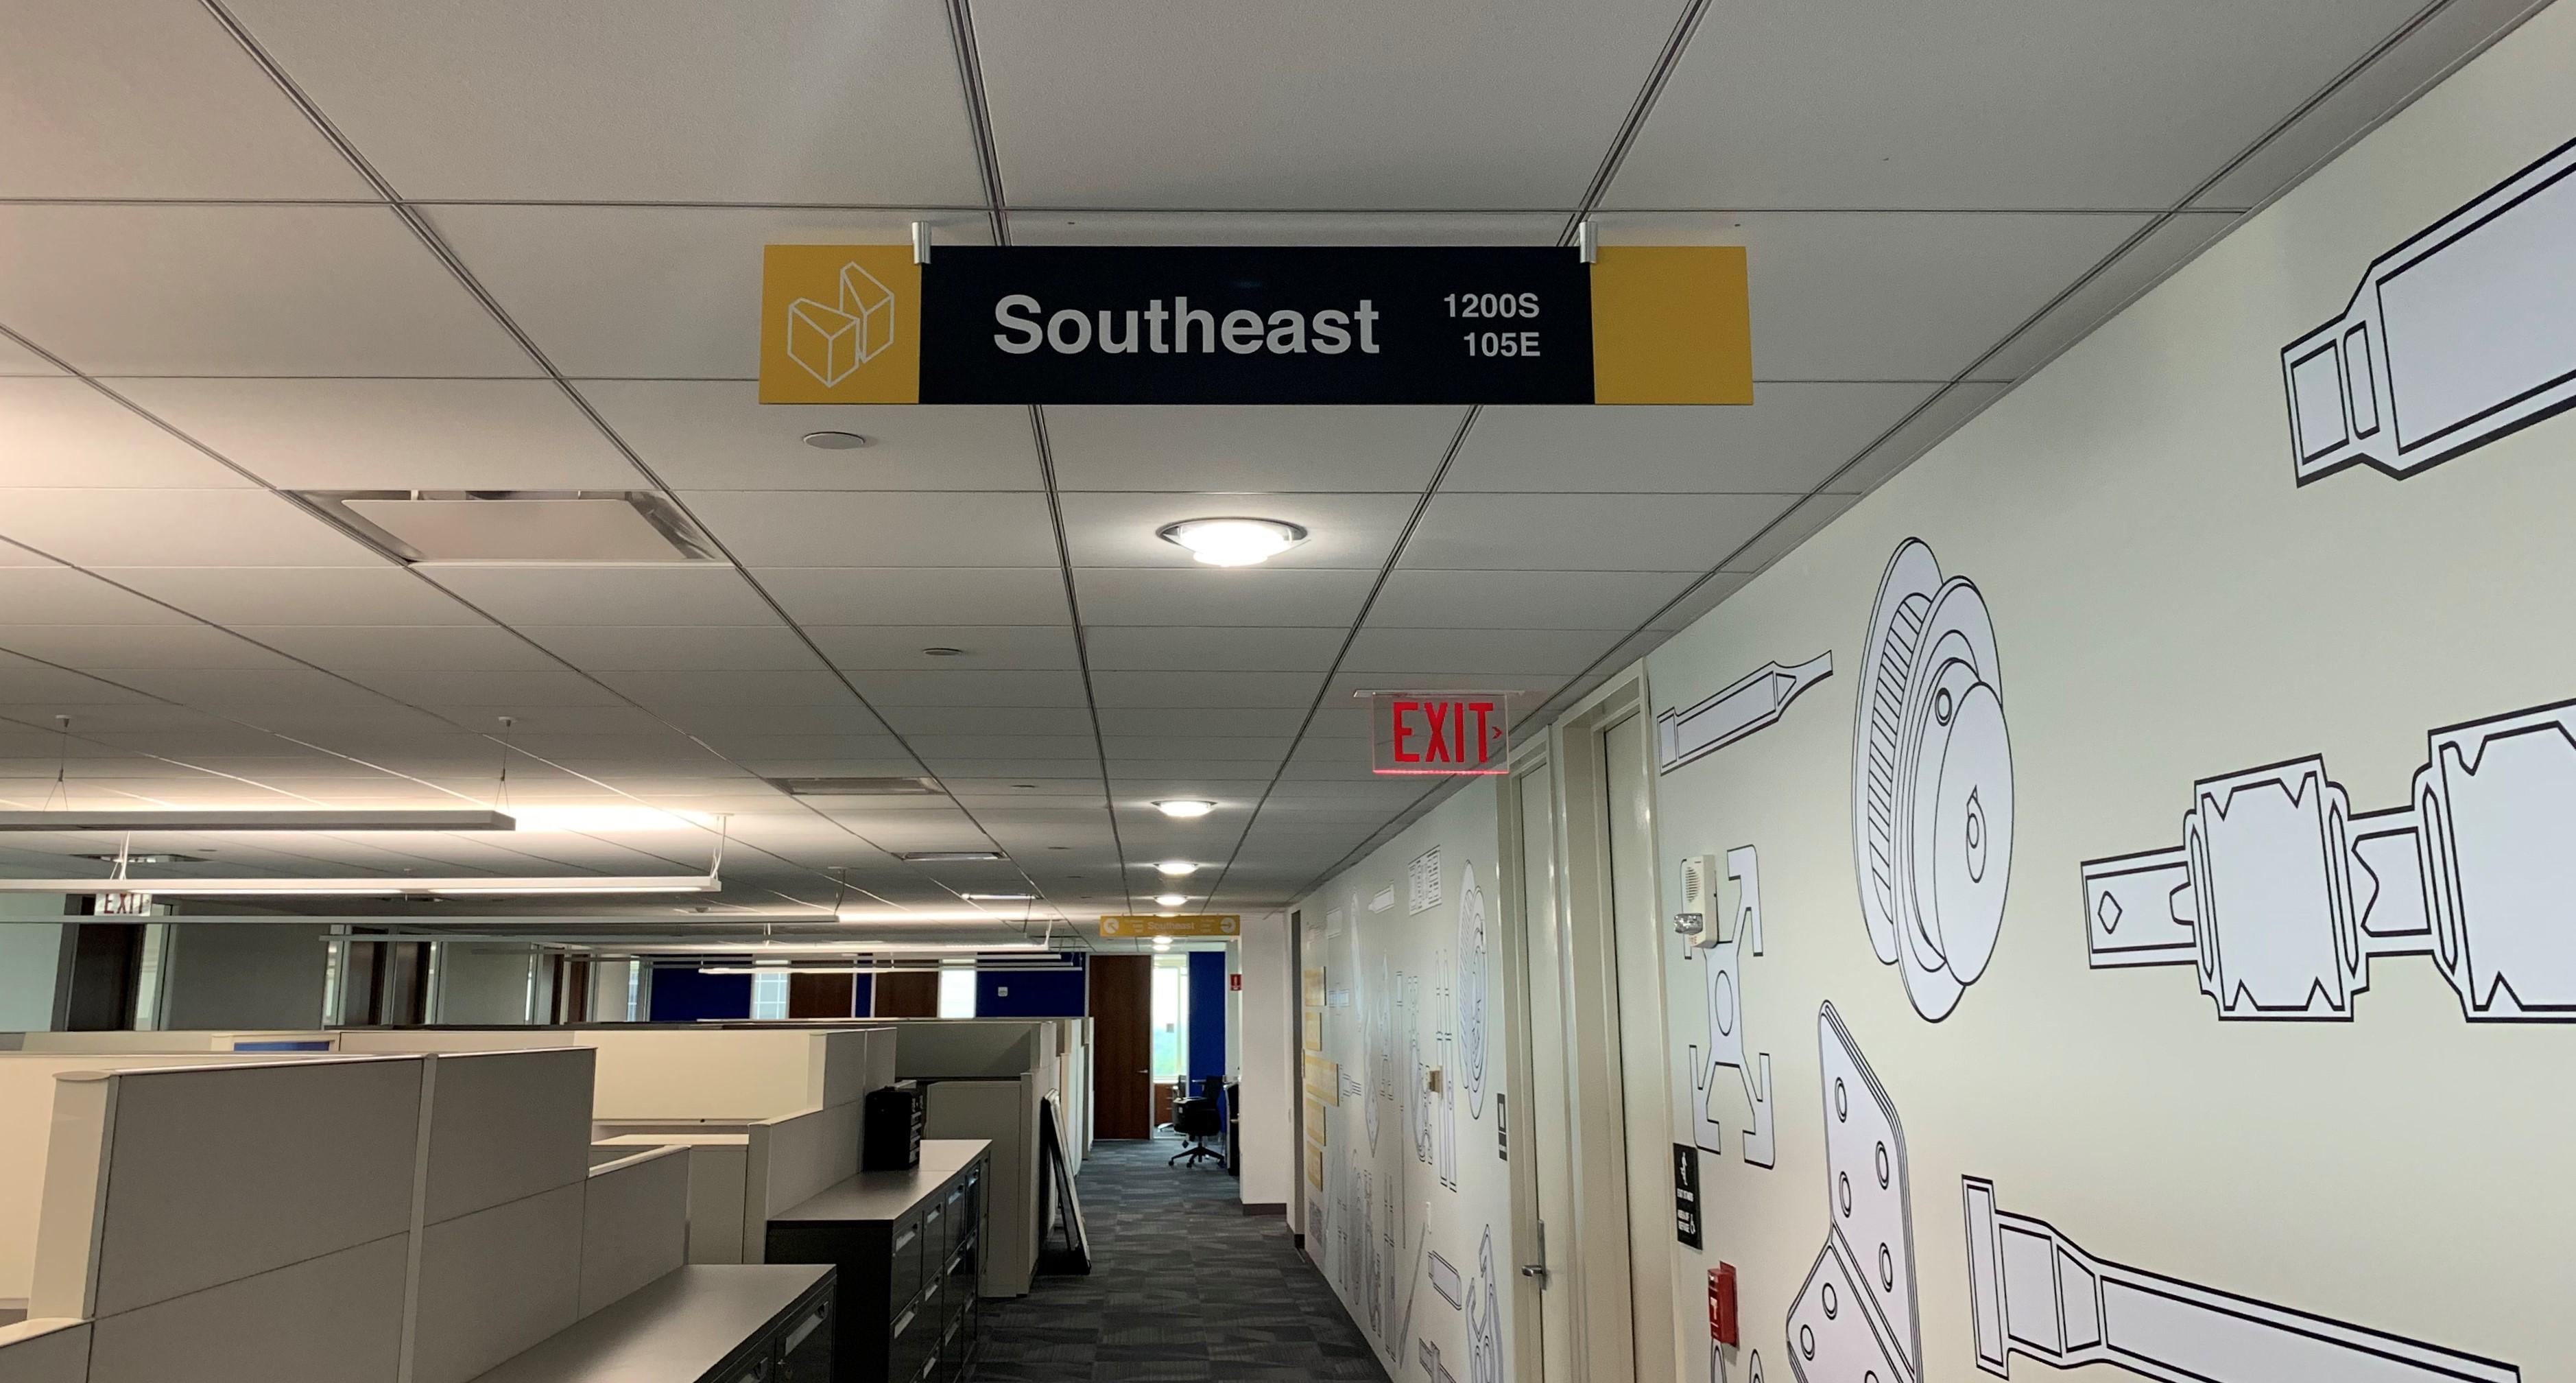 Southeast Wayfinding Sign